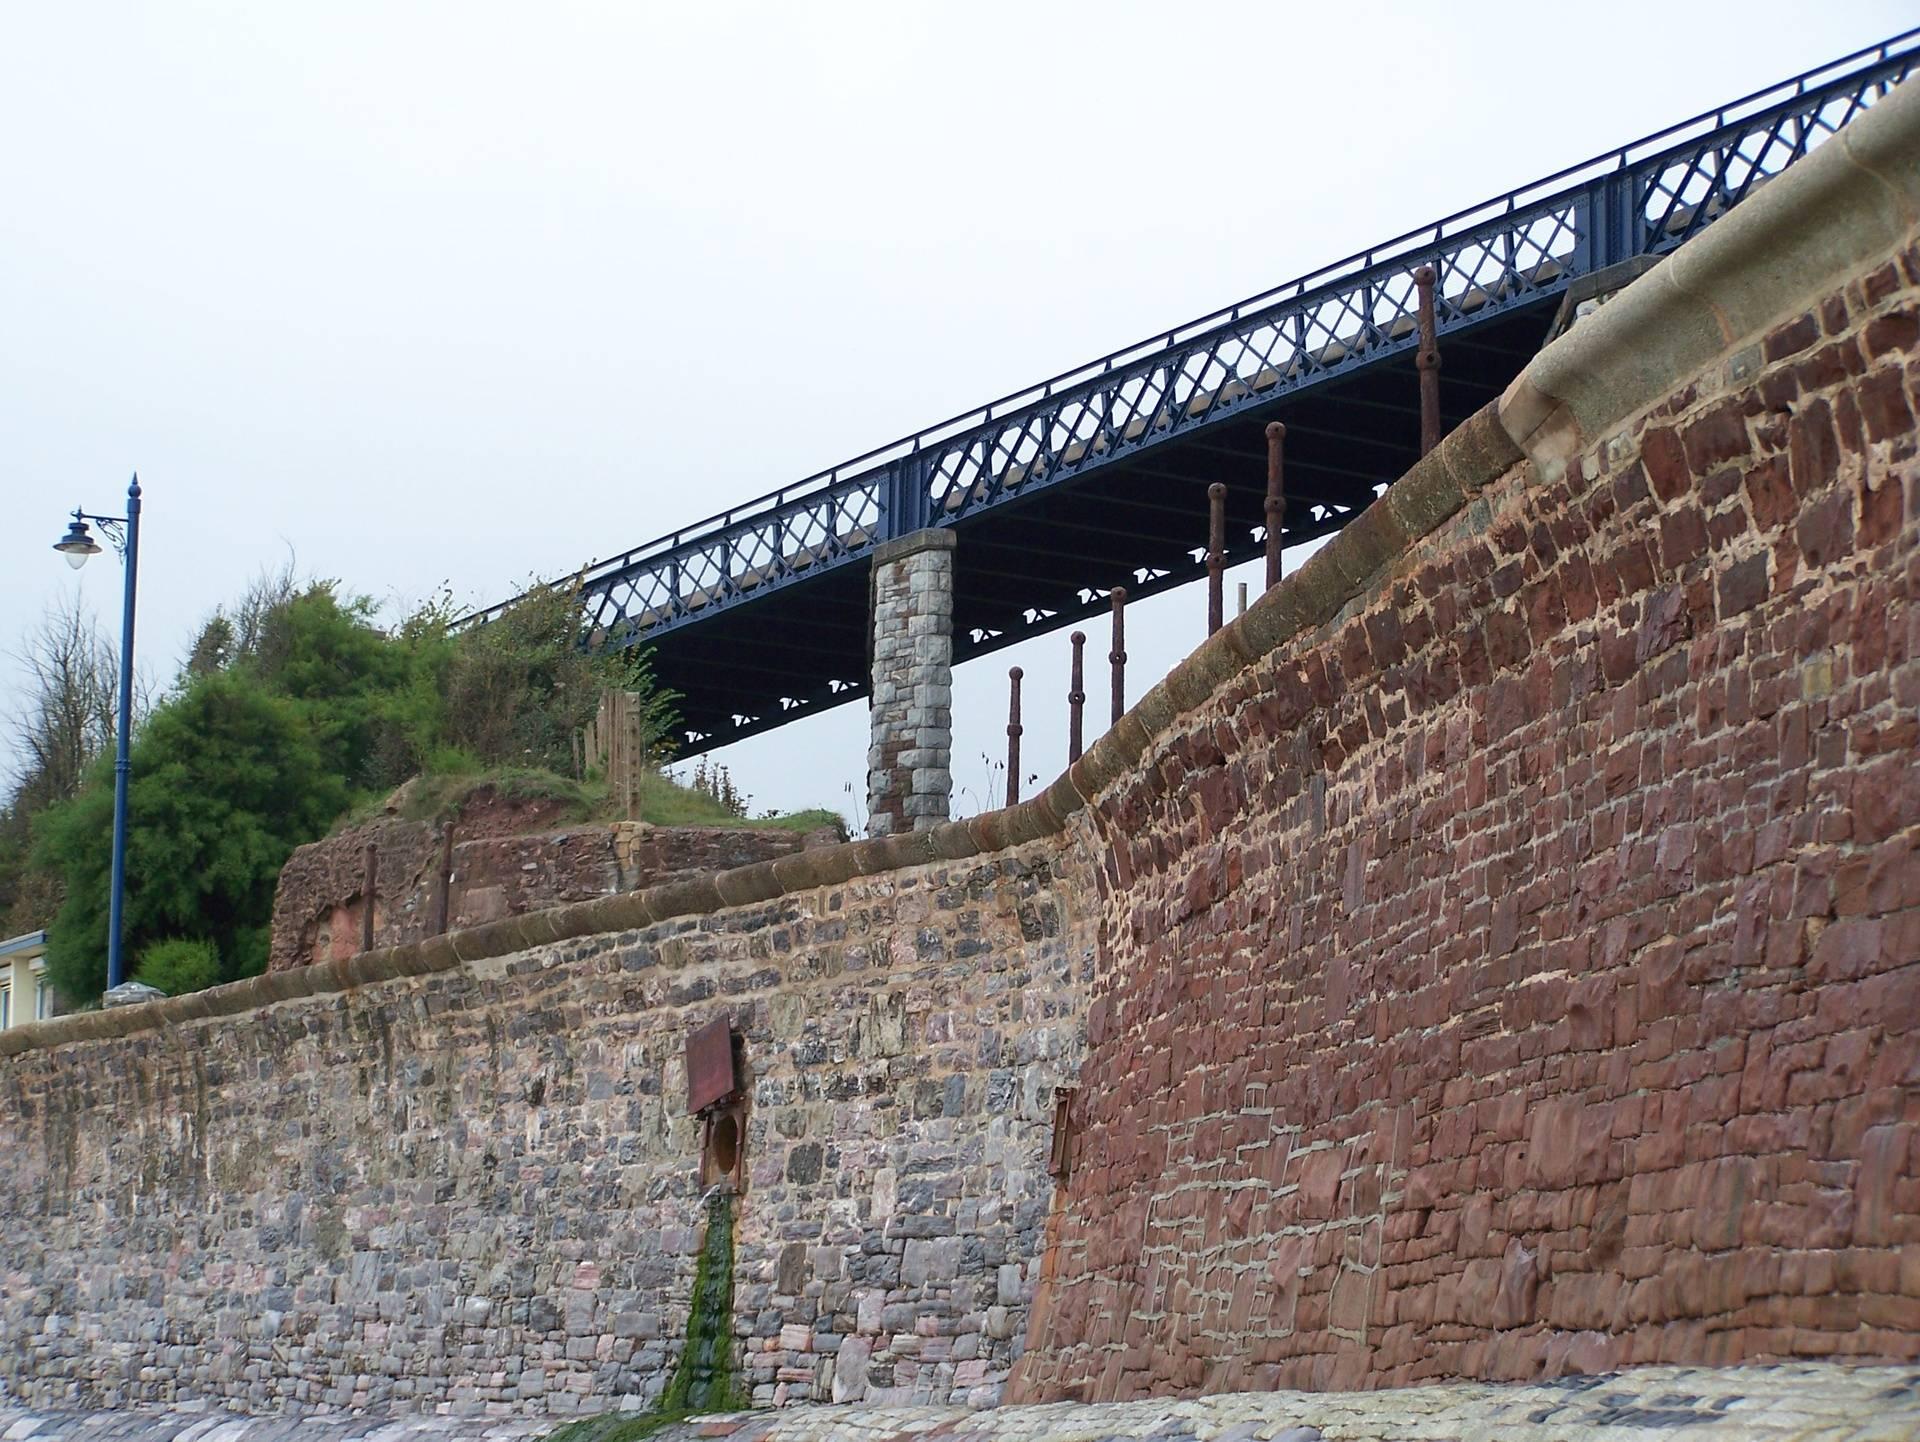 The bridge linking Teignmouth to the Park